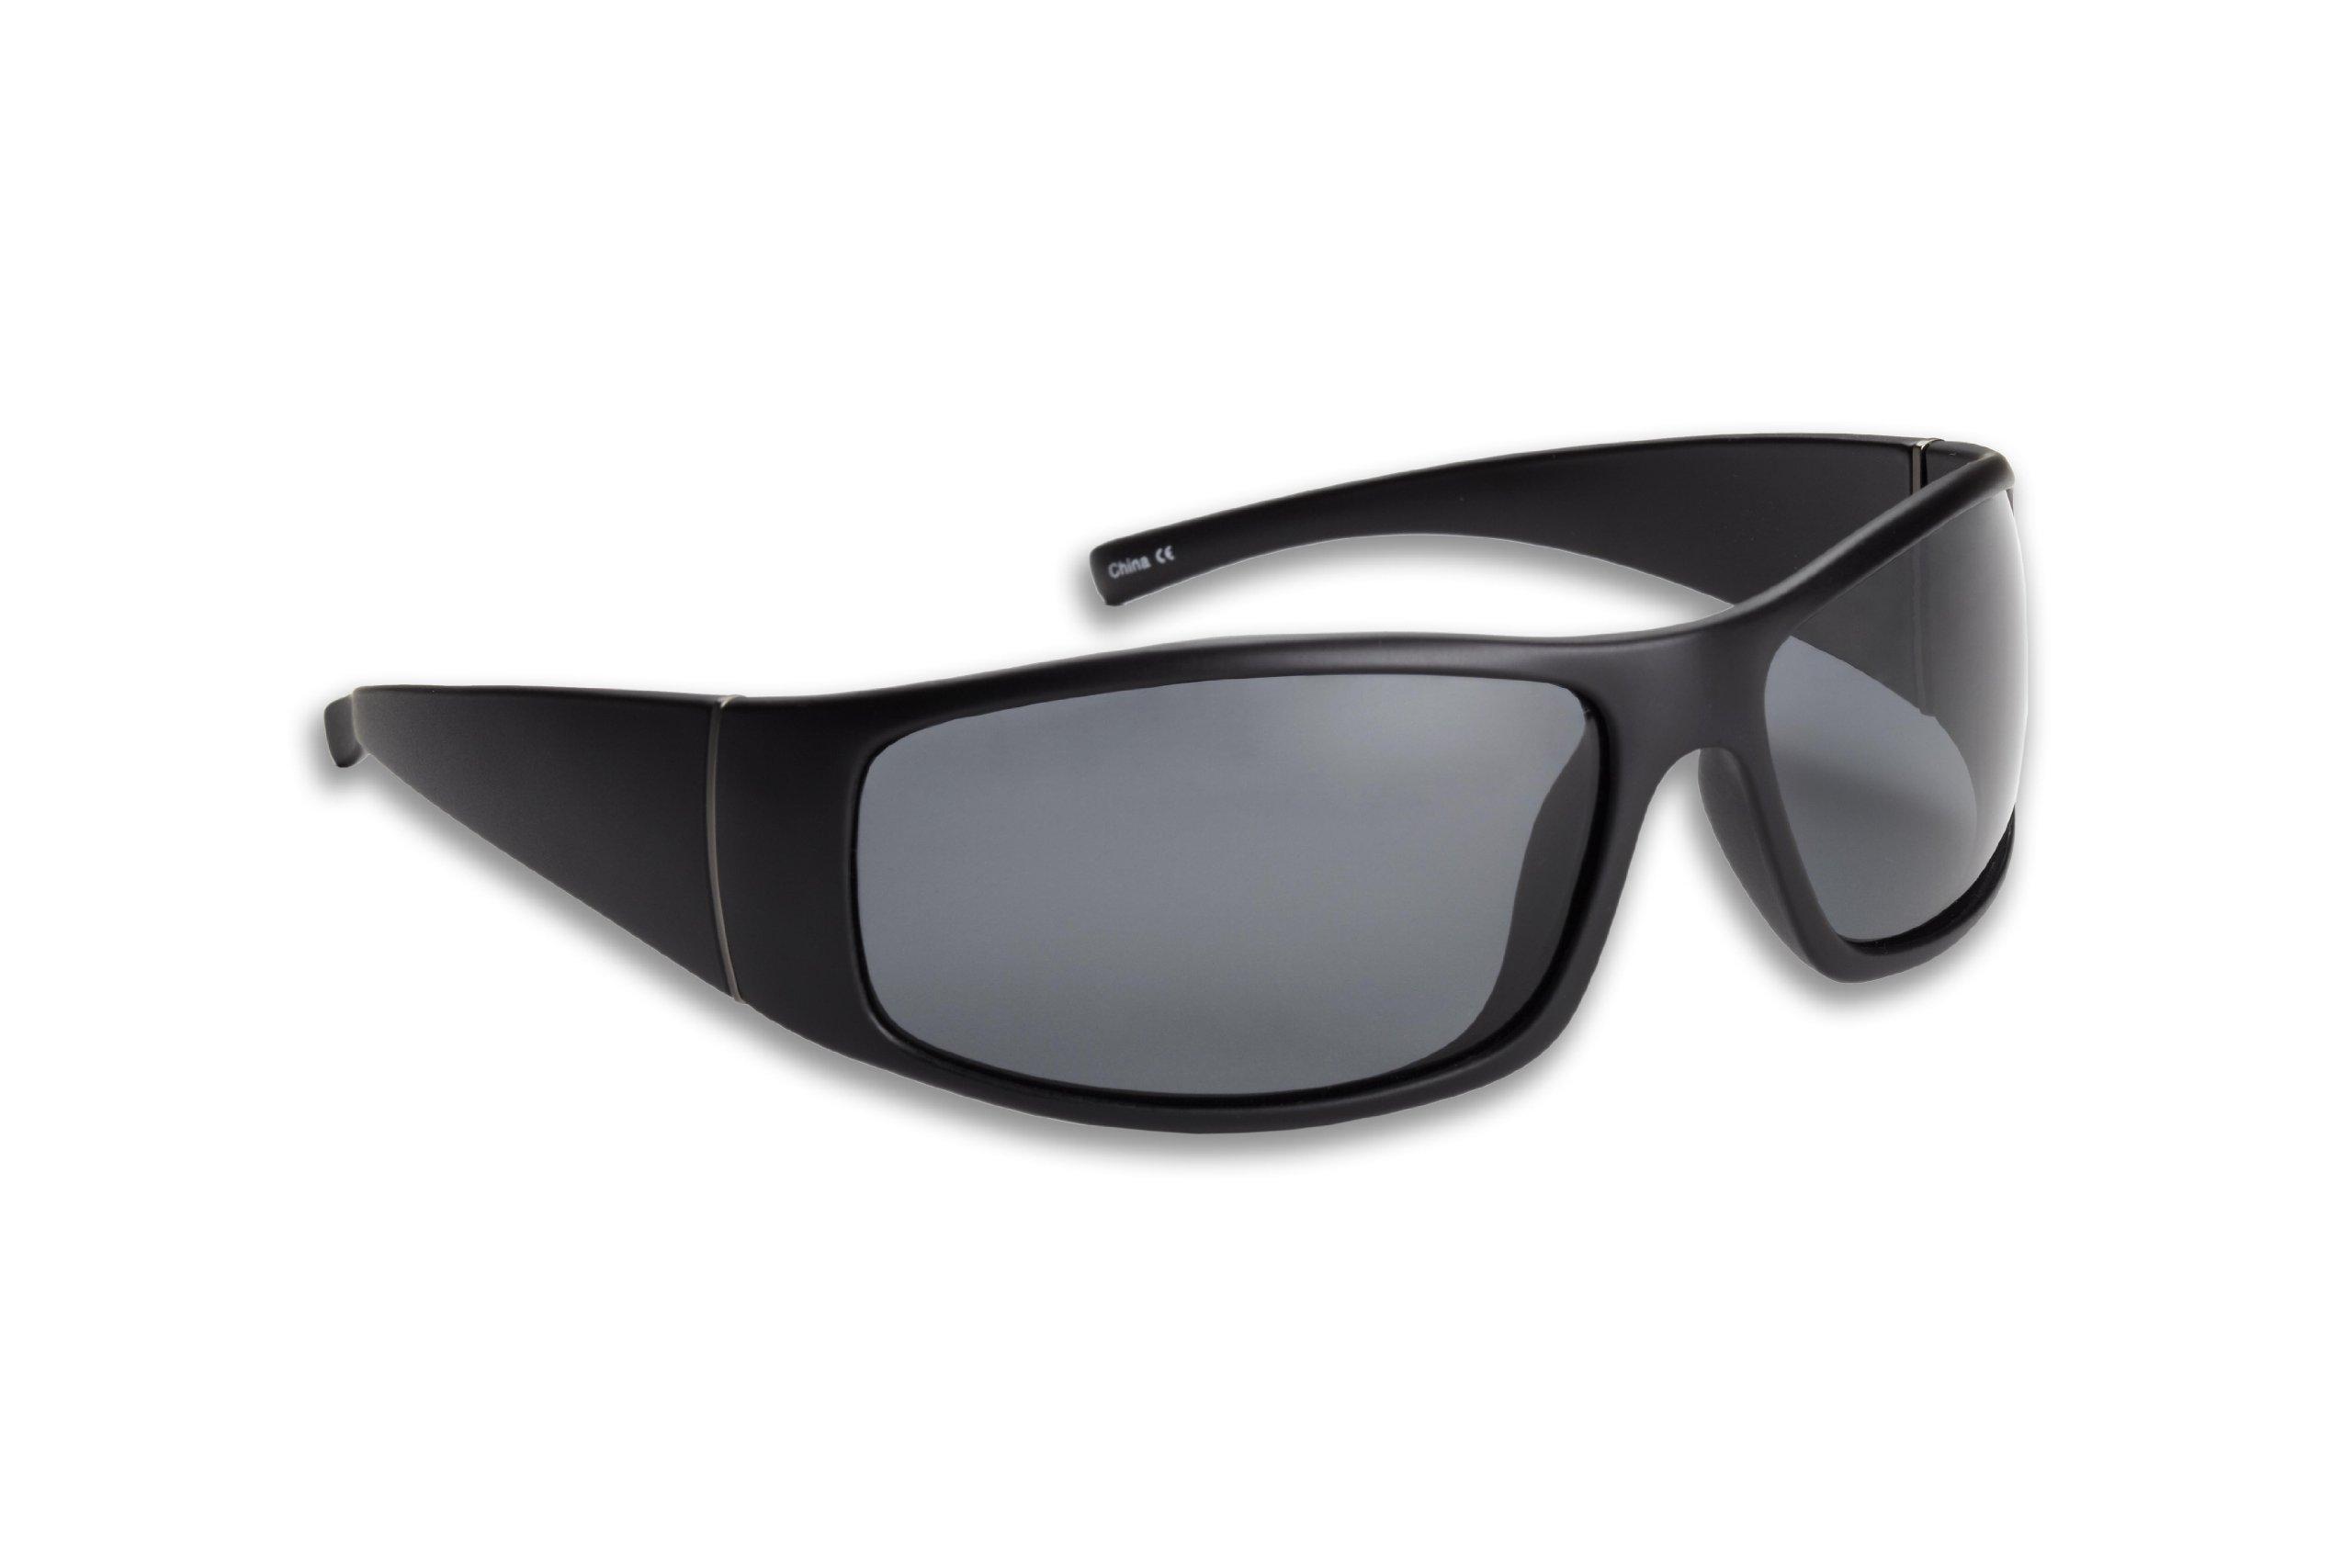 Bluefin Original Polarized Sunglasses